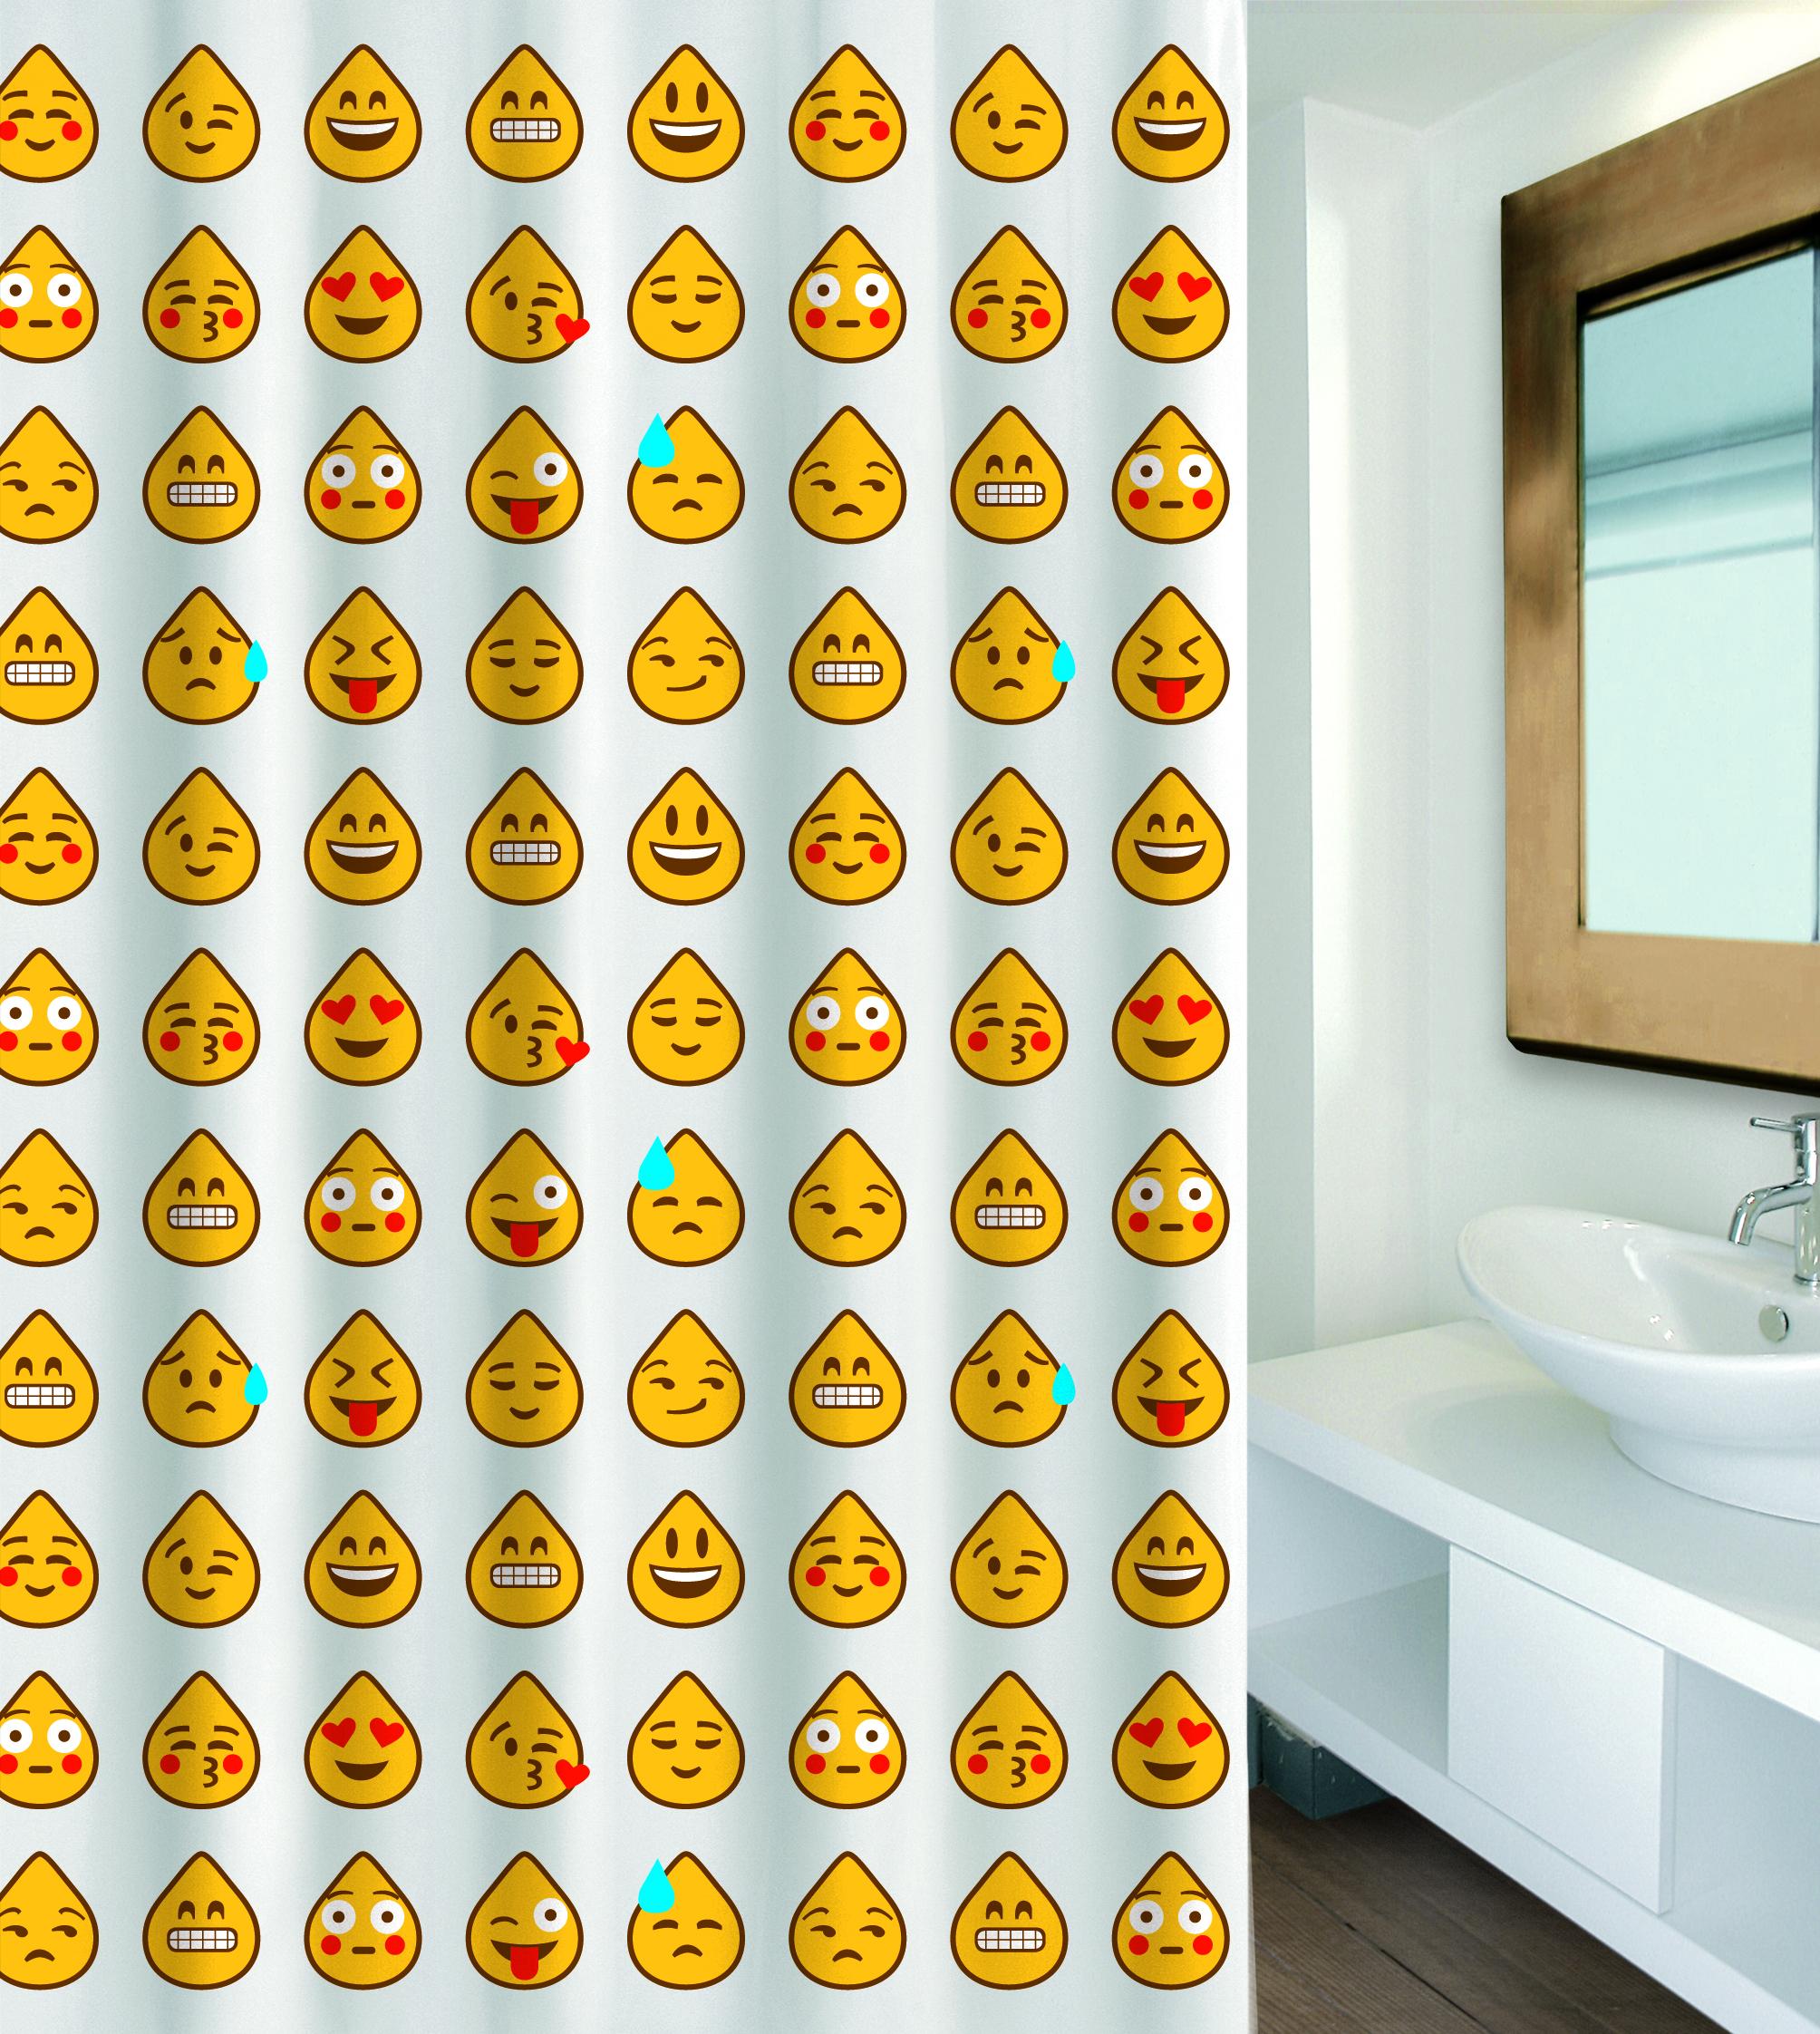 MSV Duschvorhang 180x200cm Anti Schimmel Textil Badewannenvorhang Wannenvorhang Emoji